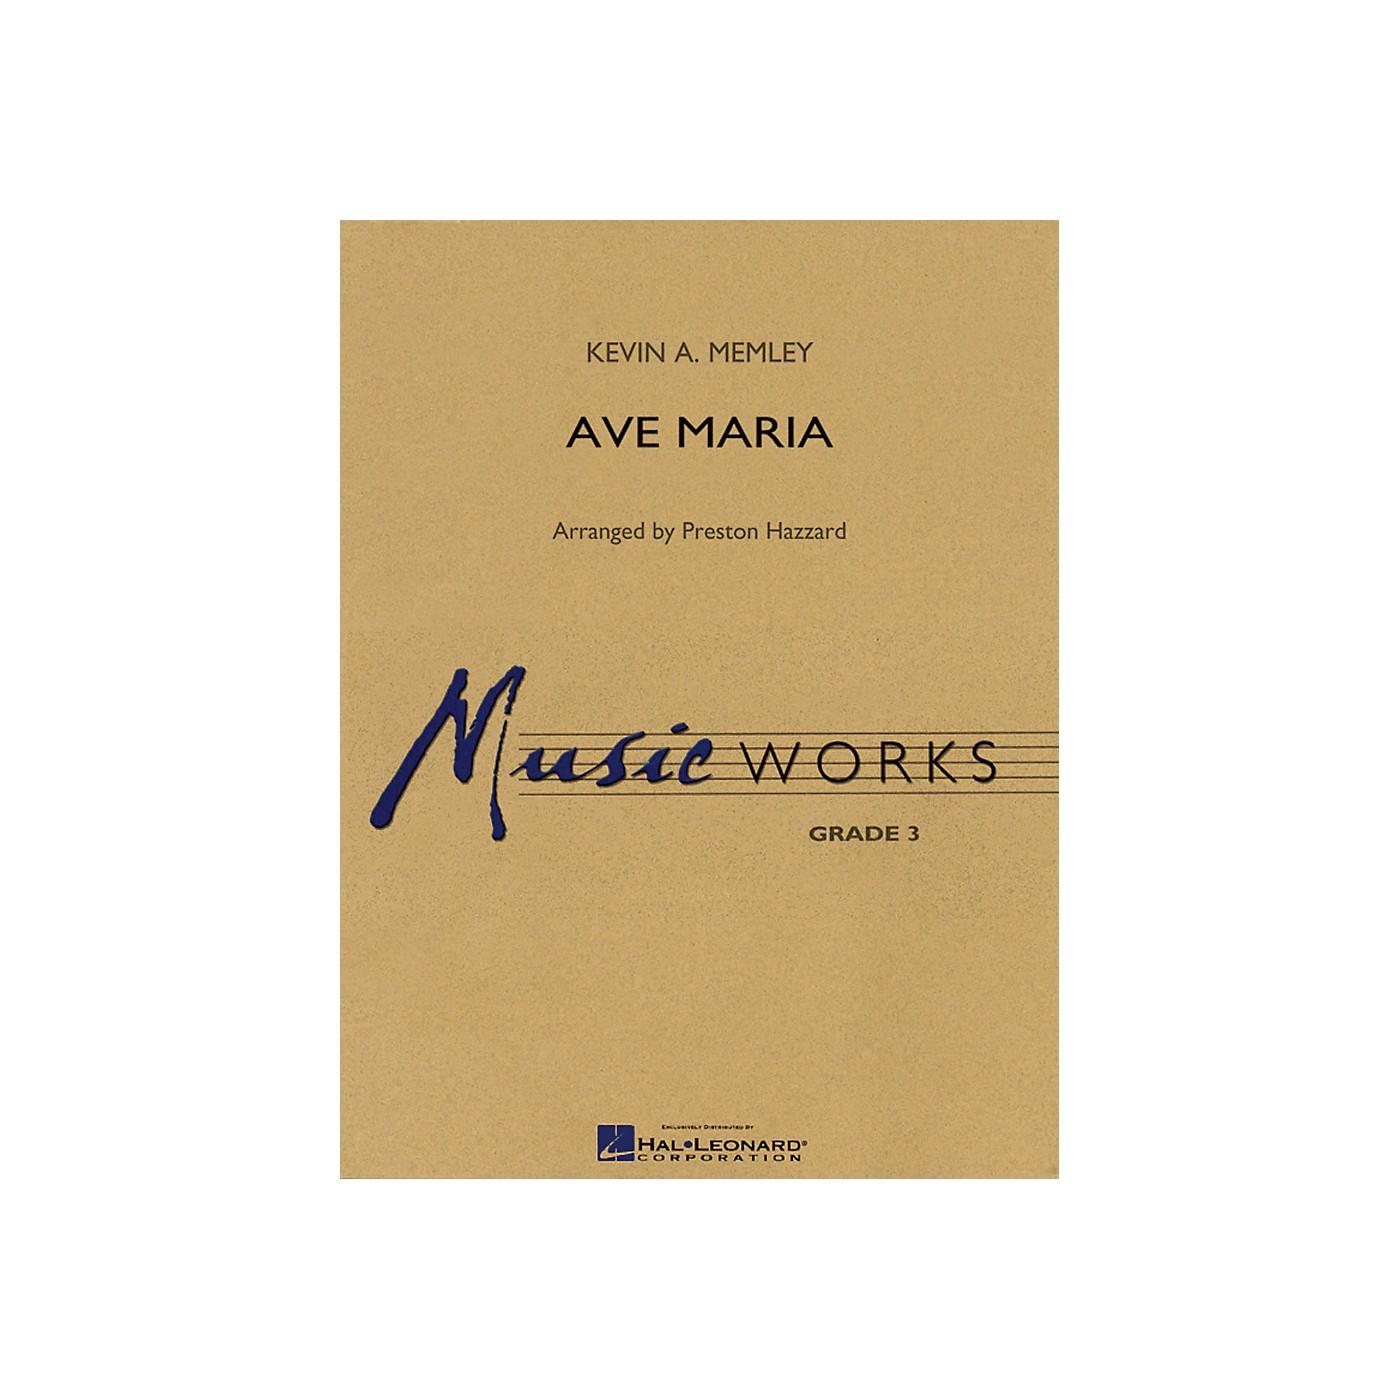 Hal Leonard Ave Maria - Music Works Series Grade 3 thumbnail